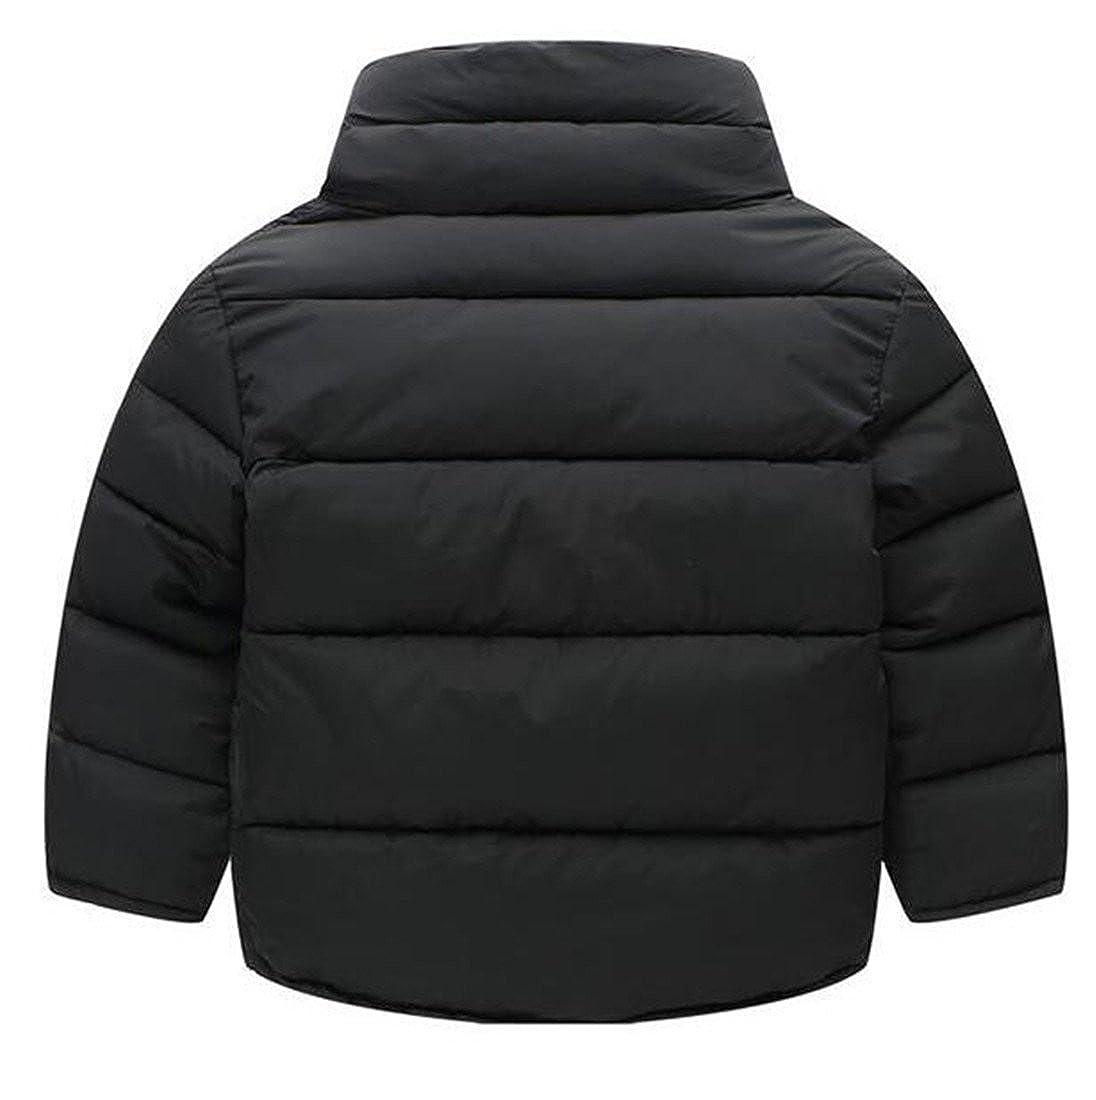 Sweatwater Girls Boys Winter Bubble Down Button Front Parkas Jackets Coat